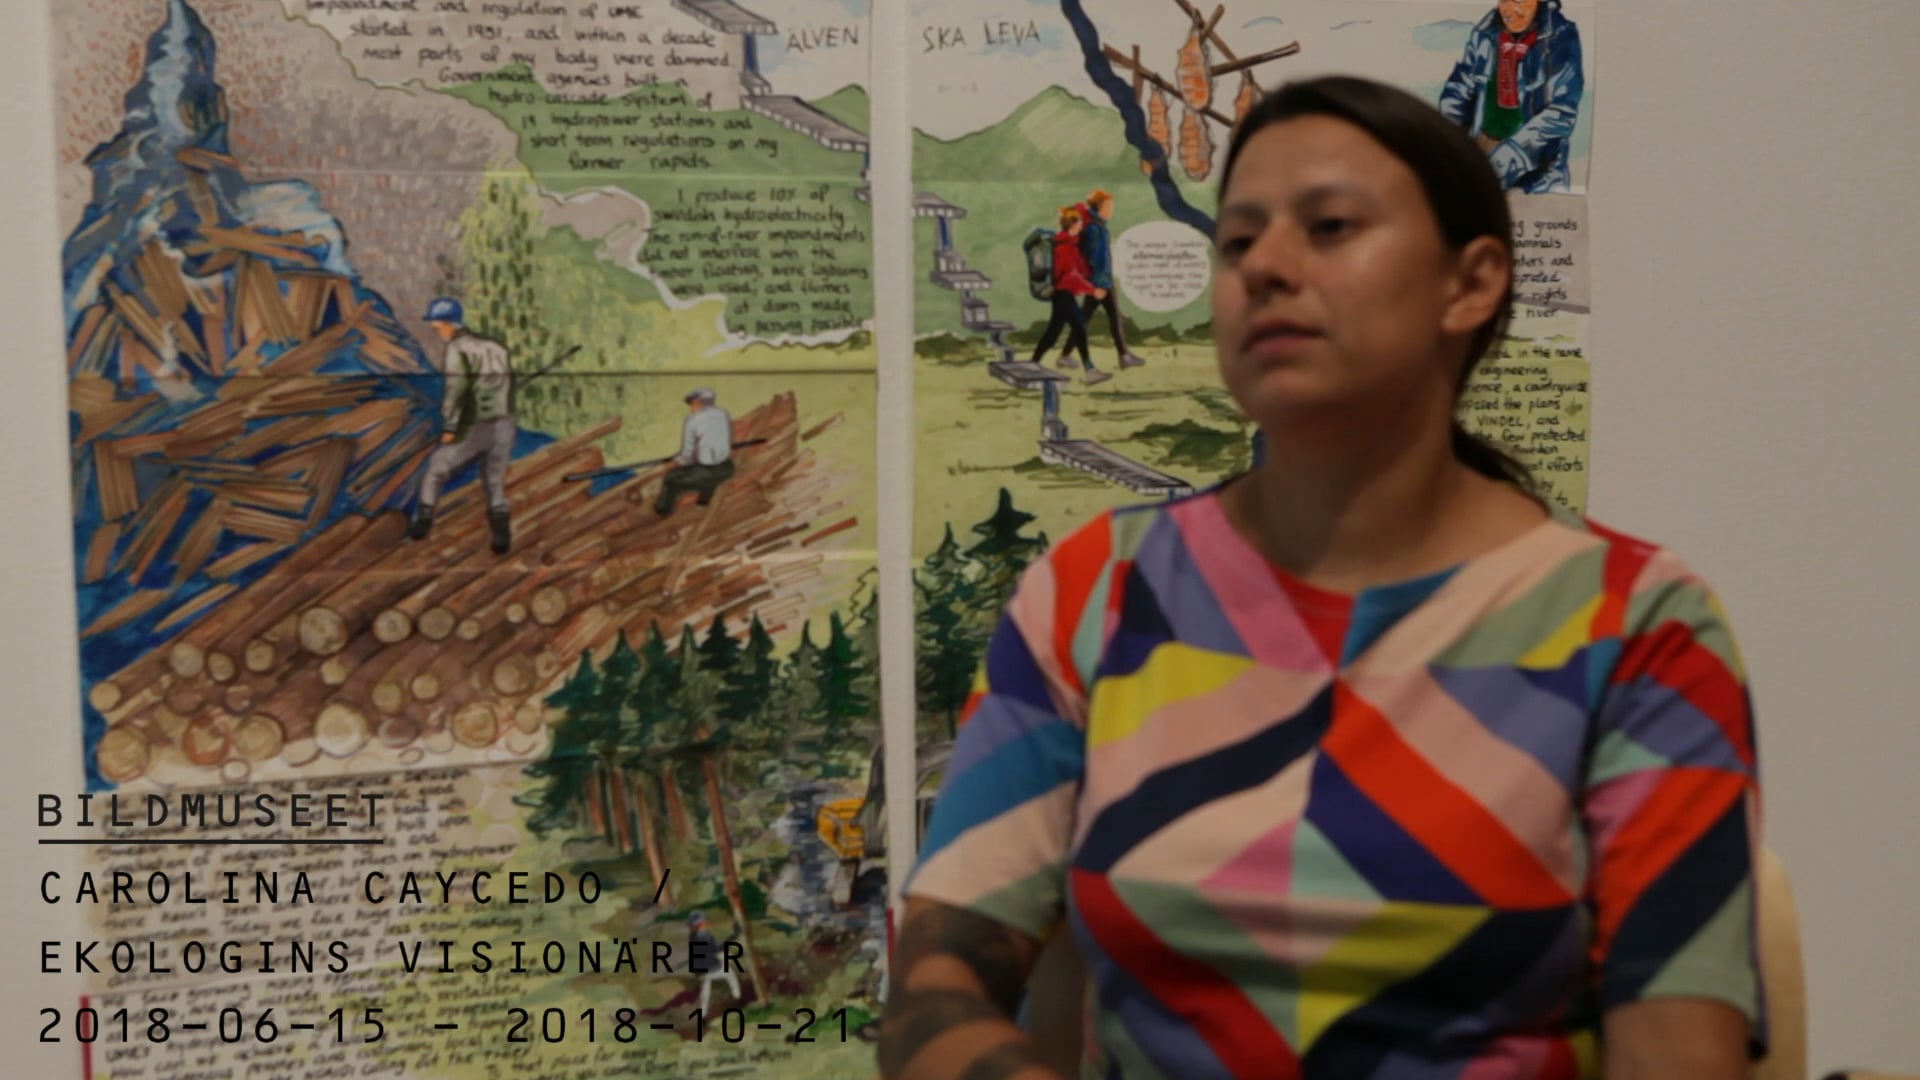 Film: Ekologins visionärer / Carolina Caycedo